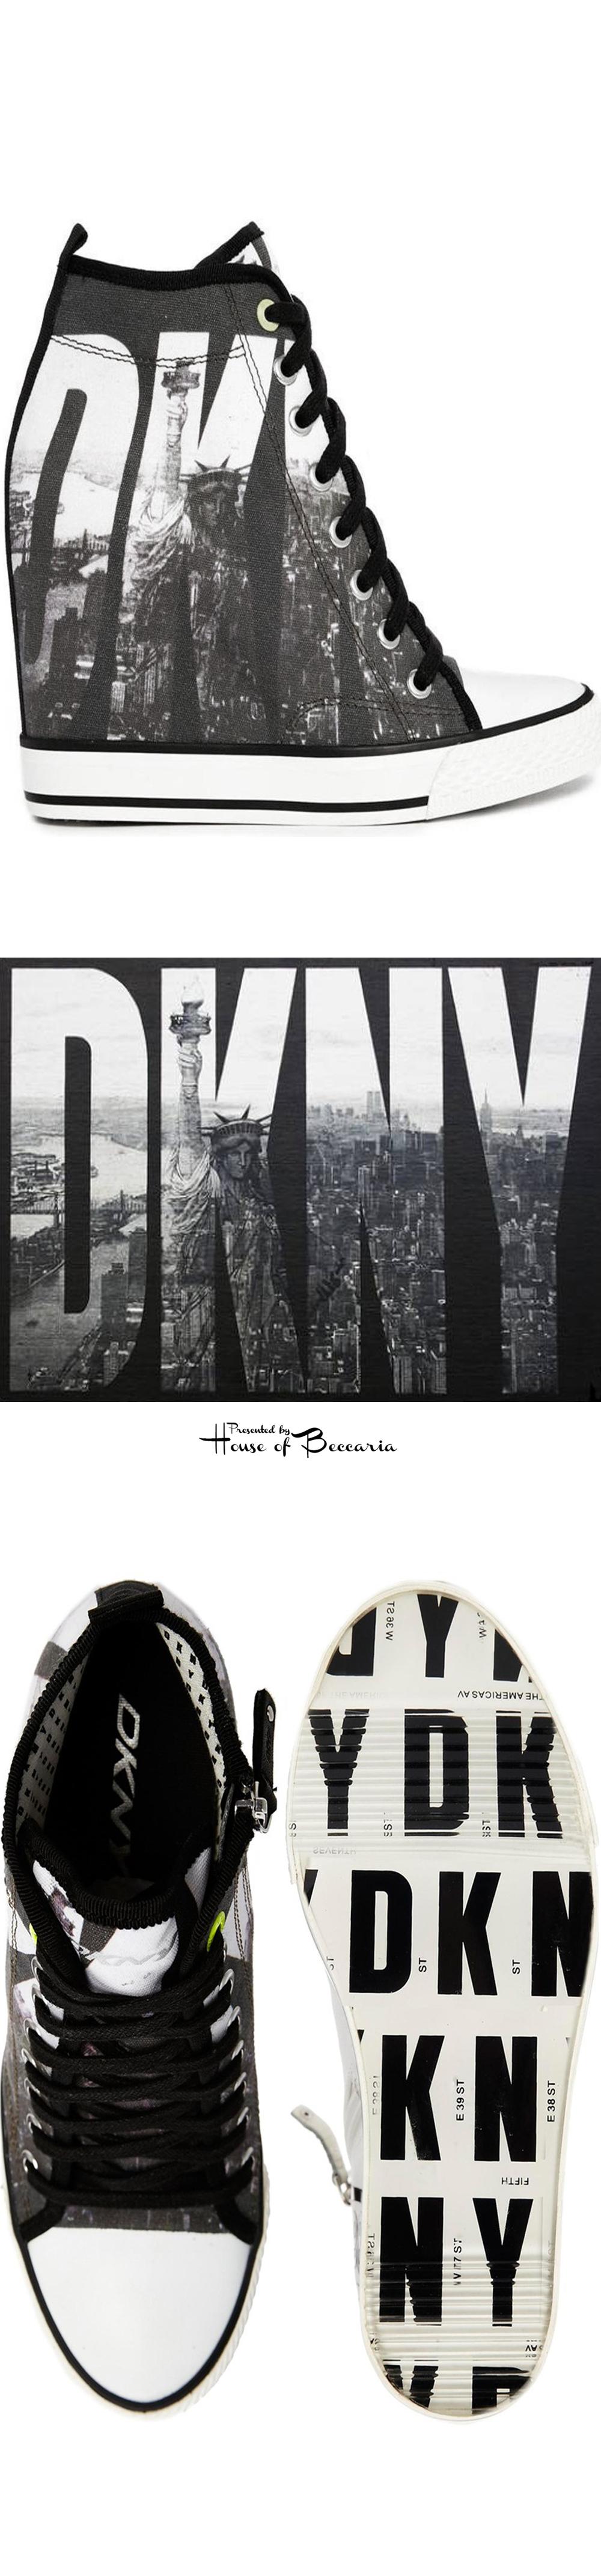 2e716cf34128 ~DKNY ACTIVE Grommet Billboard Wedge Trainers